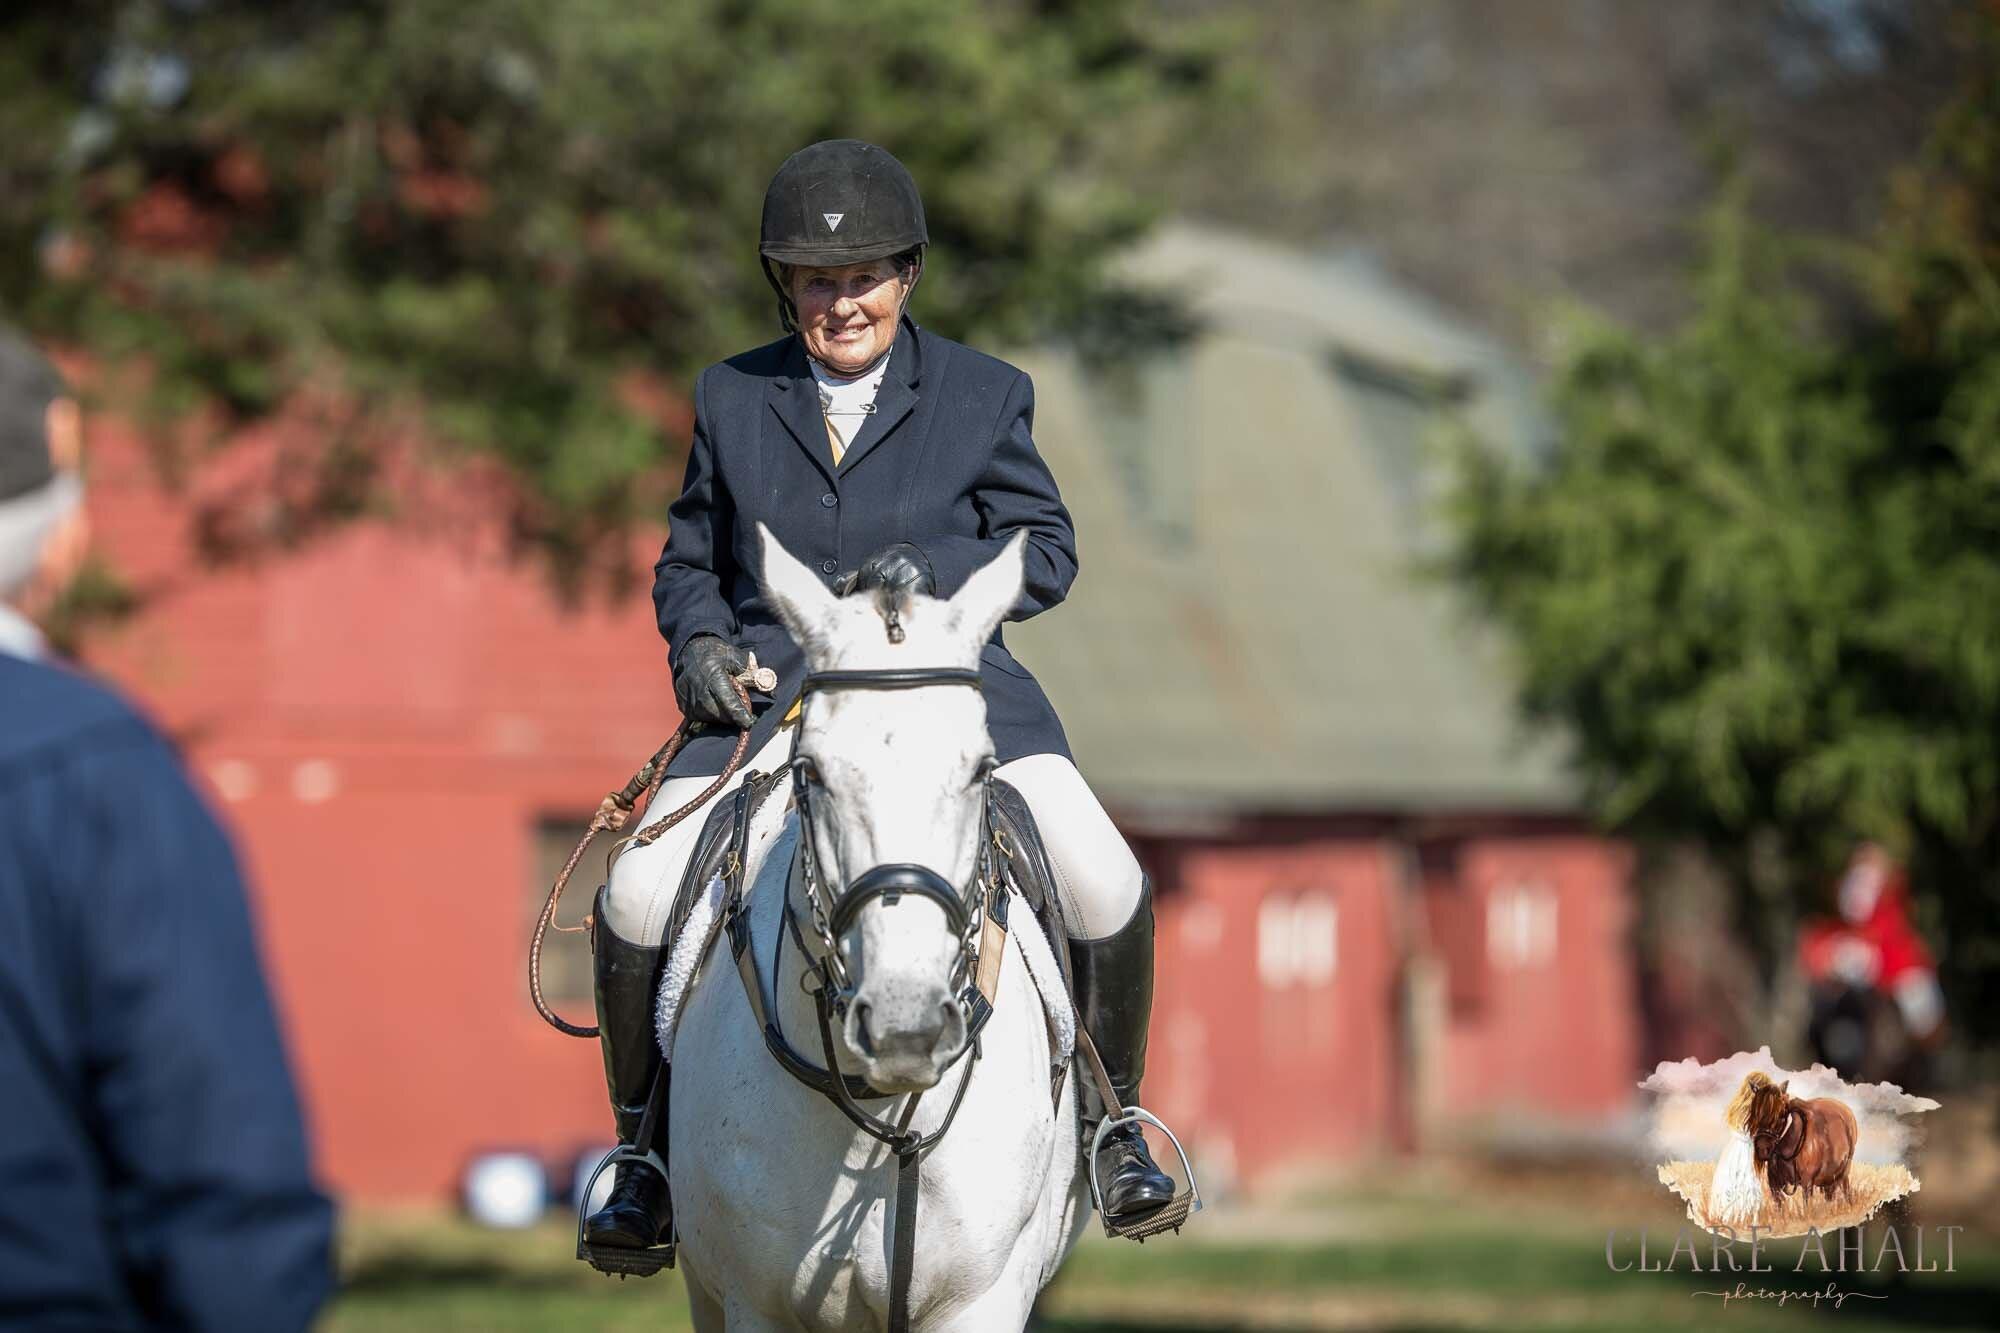 equine_photographer_potomac_md_equine_photographer_middleburg_VA_equine_portraiture_loudon_county_VA-2826.jpg